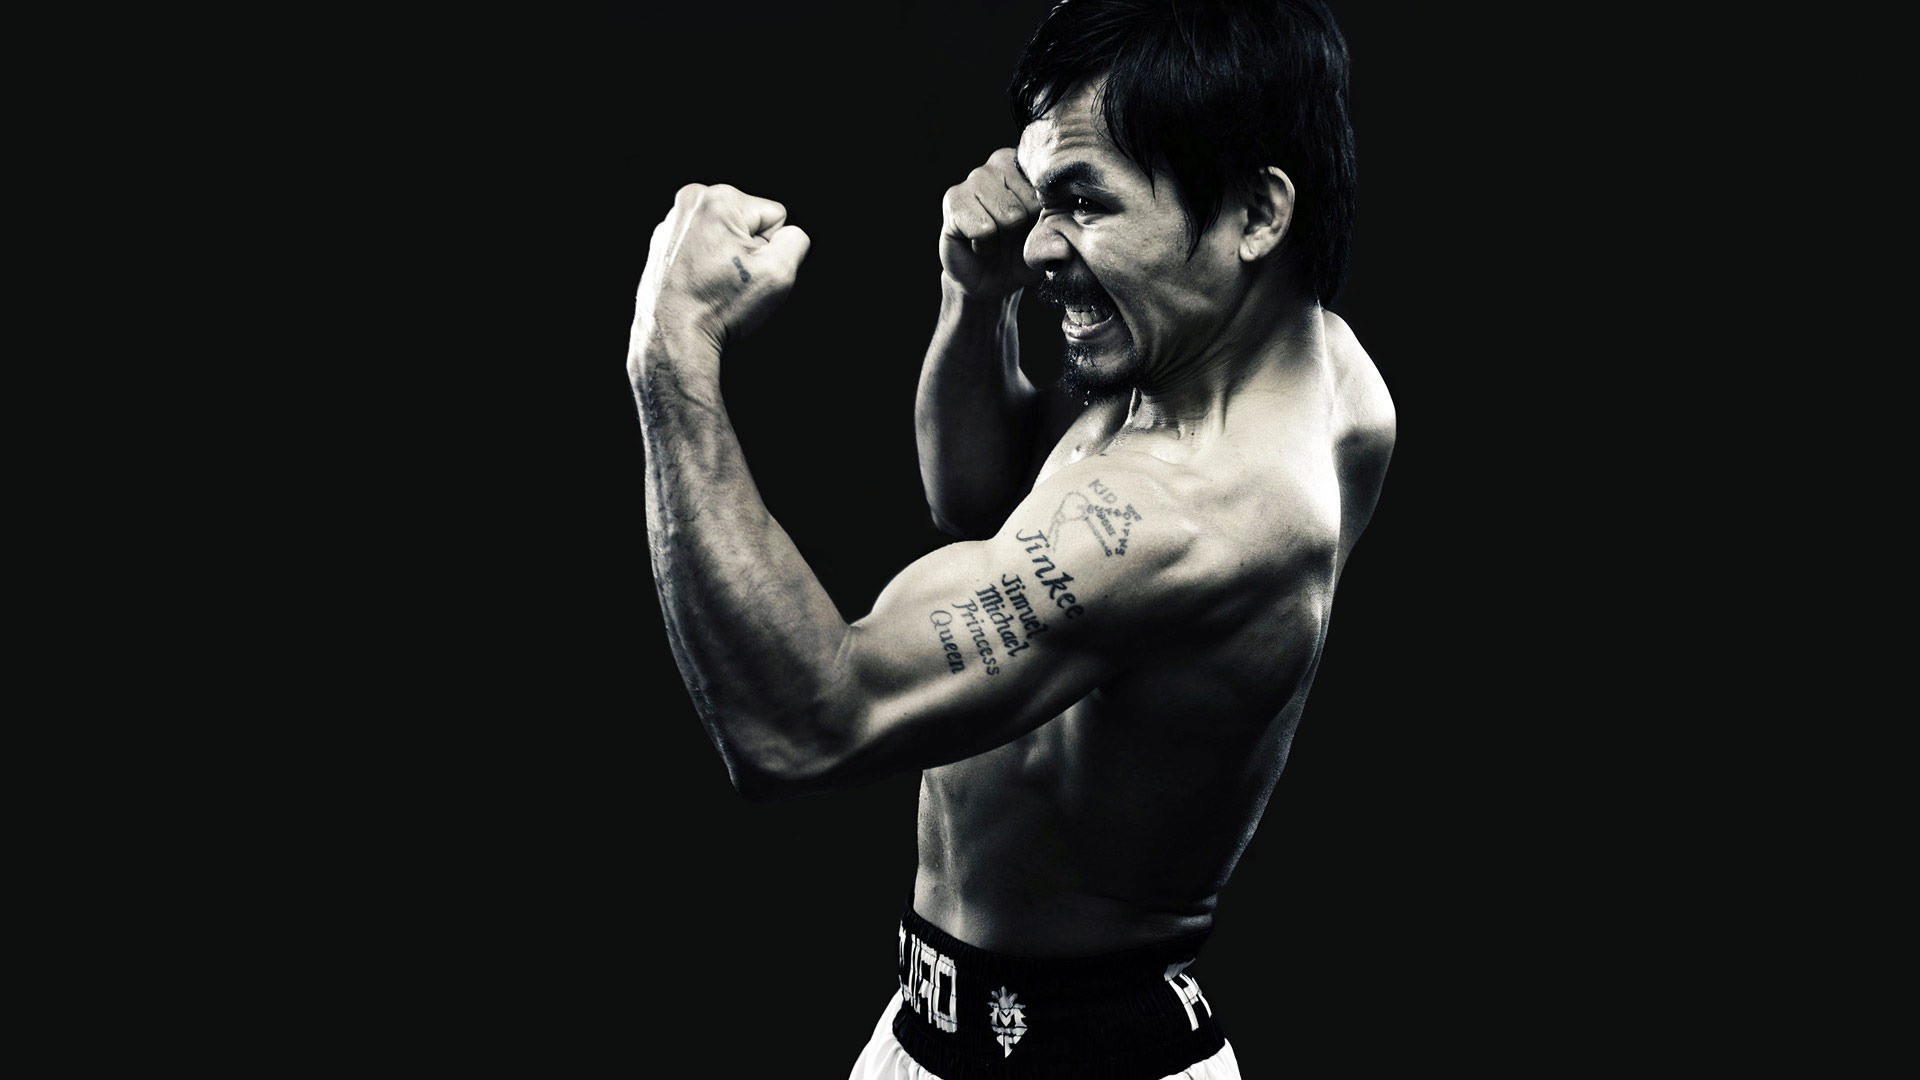 Manny Pacquiao 2015 Boxing Wallpaper